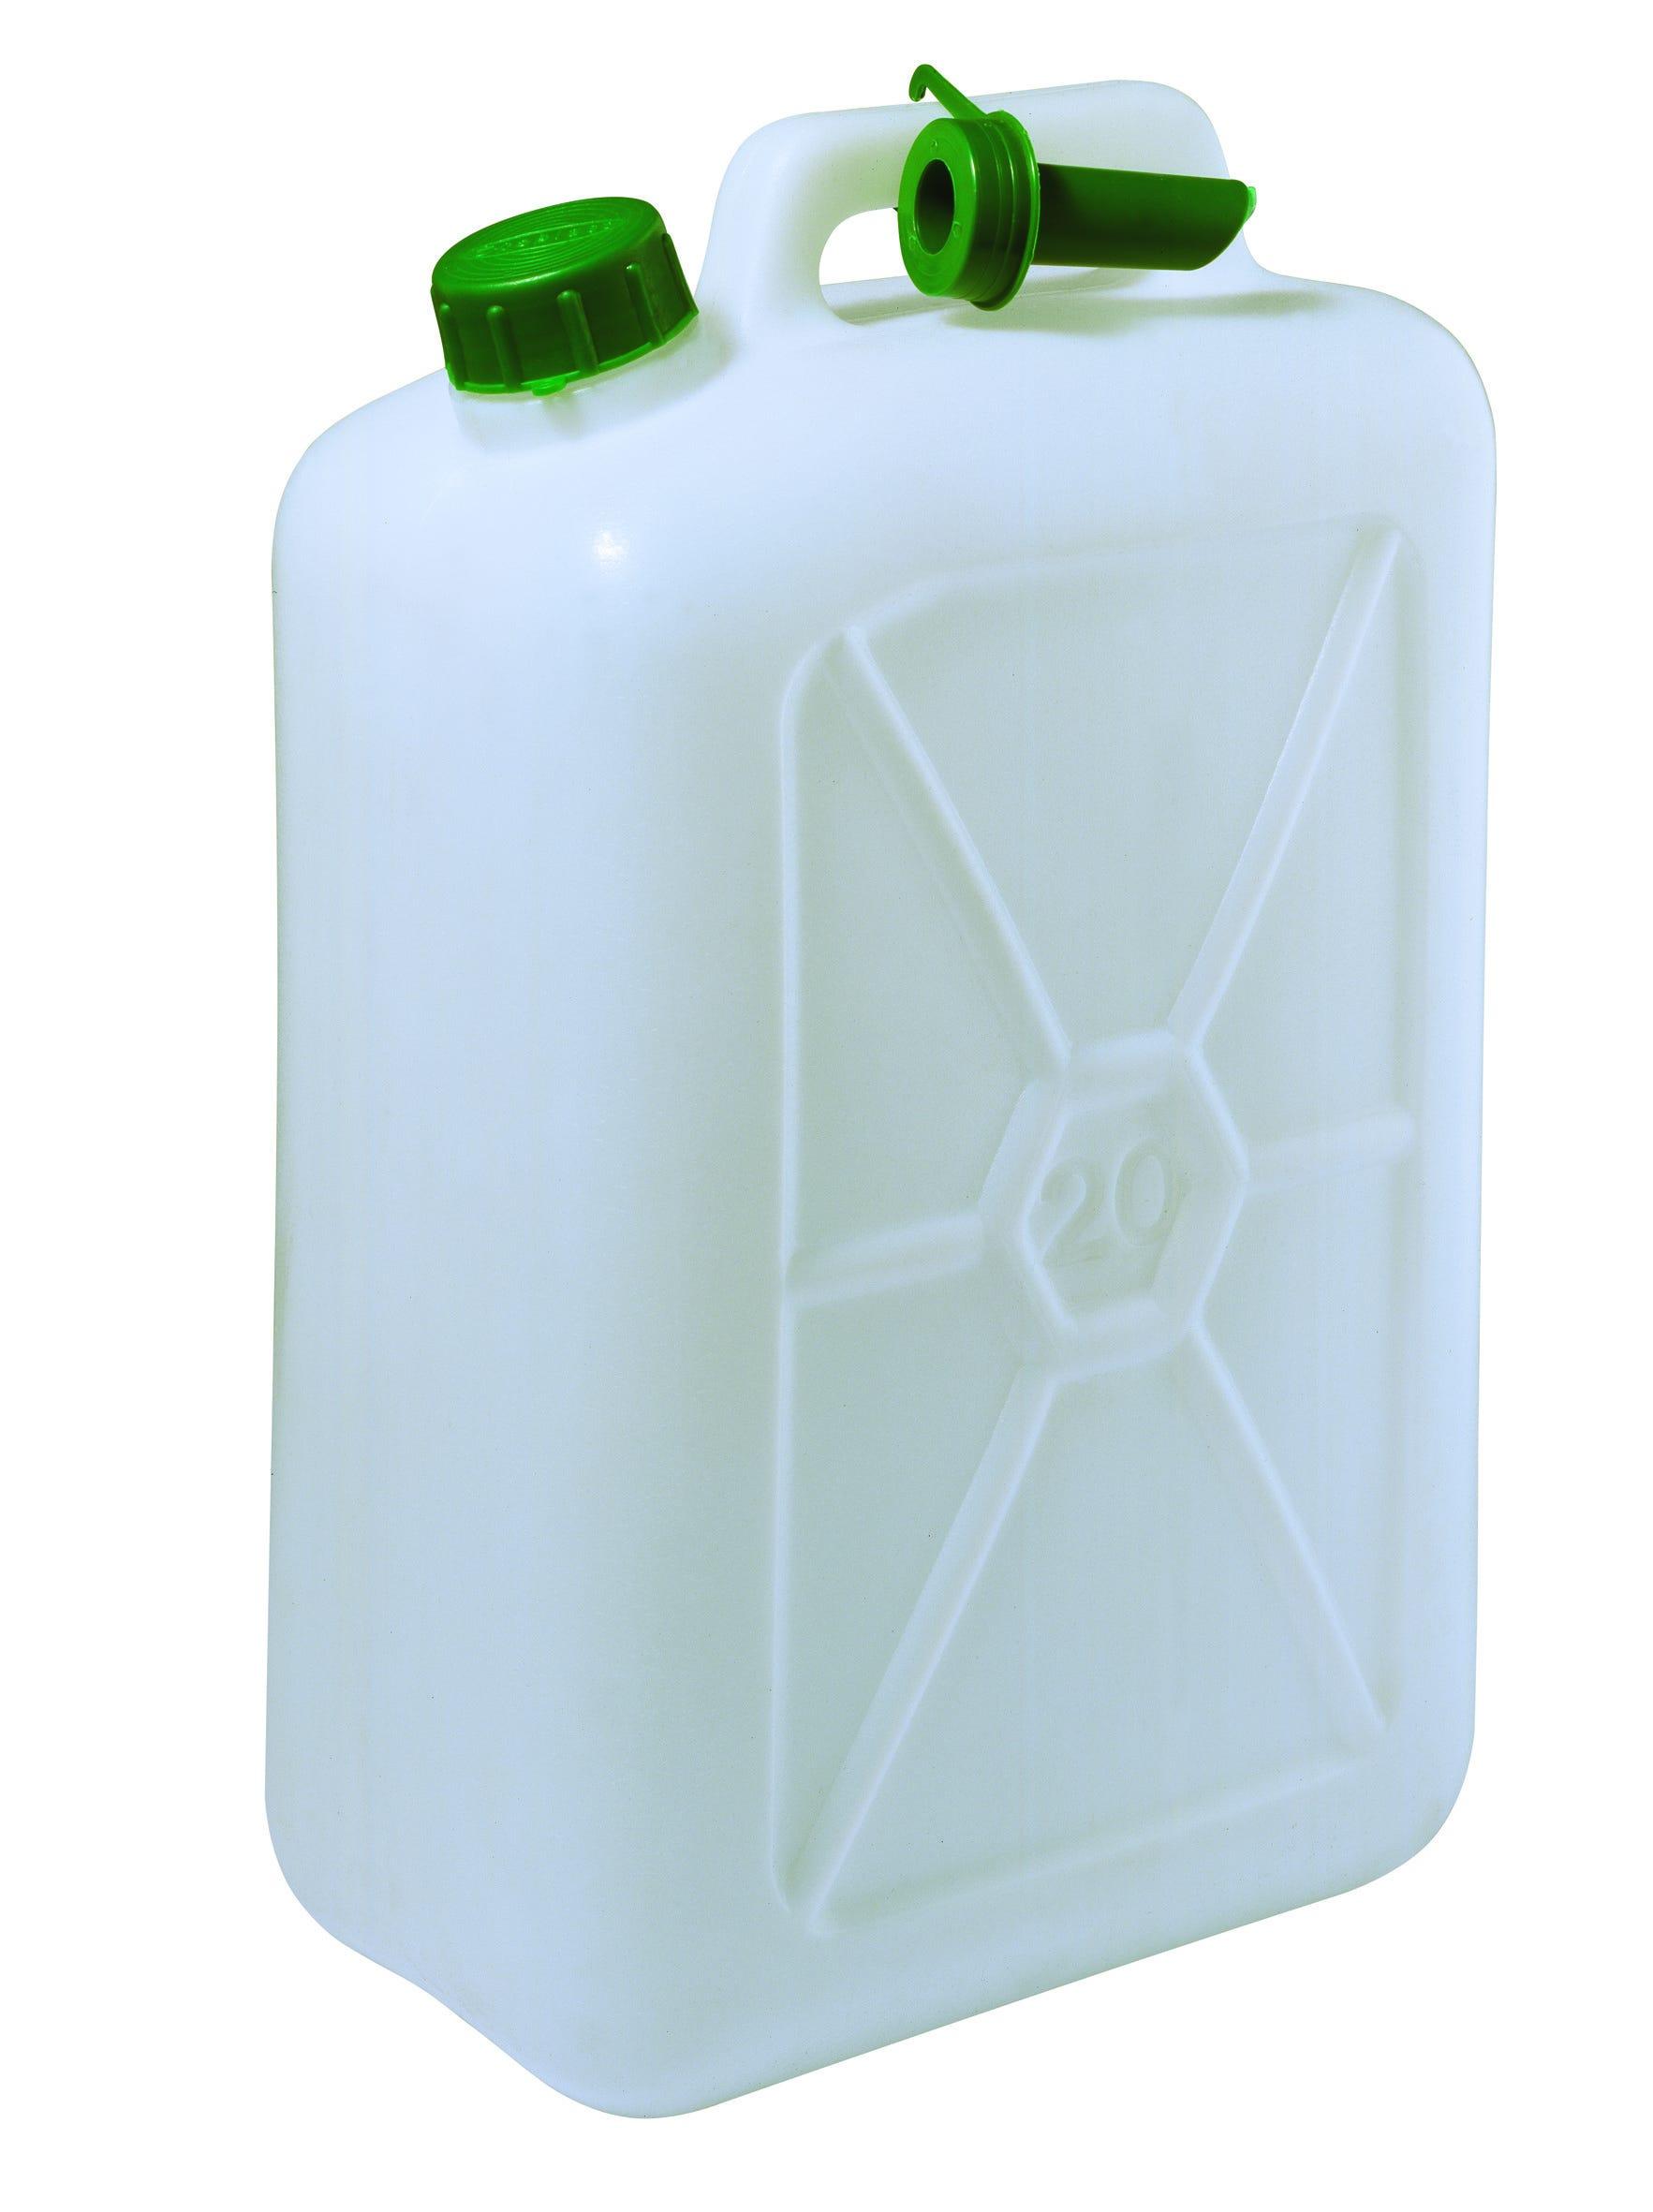 ECOPLAST Tanica Ad Uso Alimentare 28,4x47x18,4 Cm (Lxhxp) 20 L Plastica